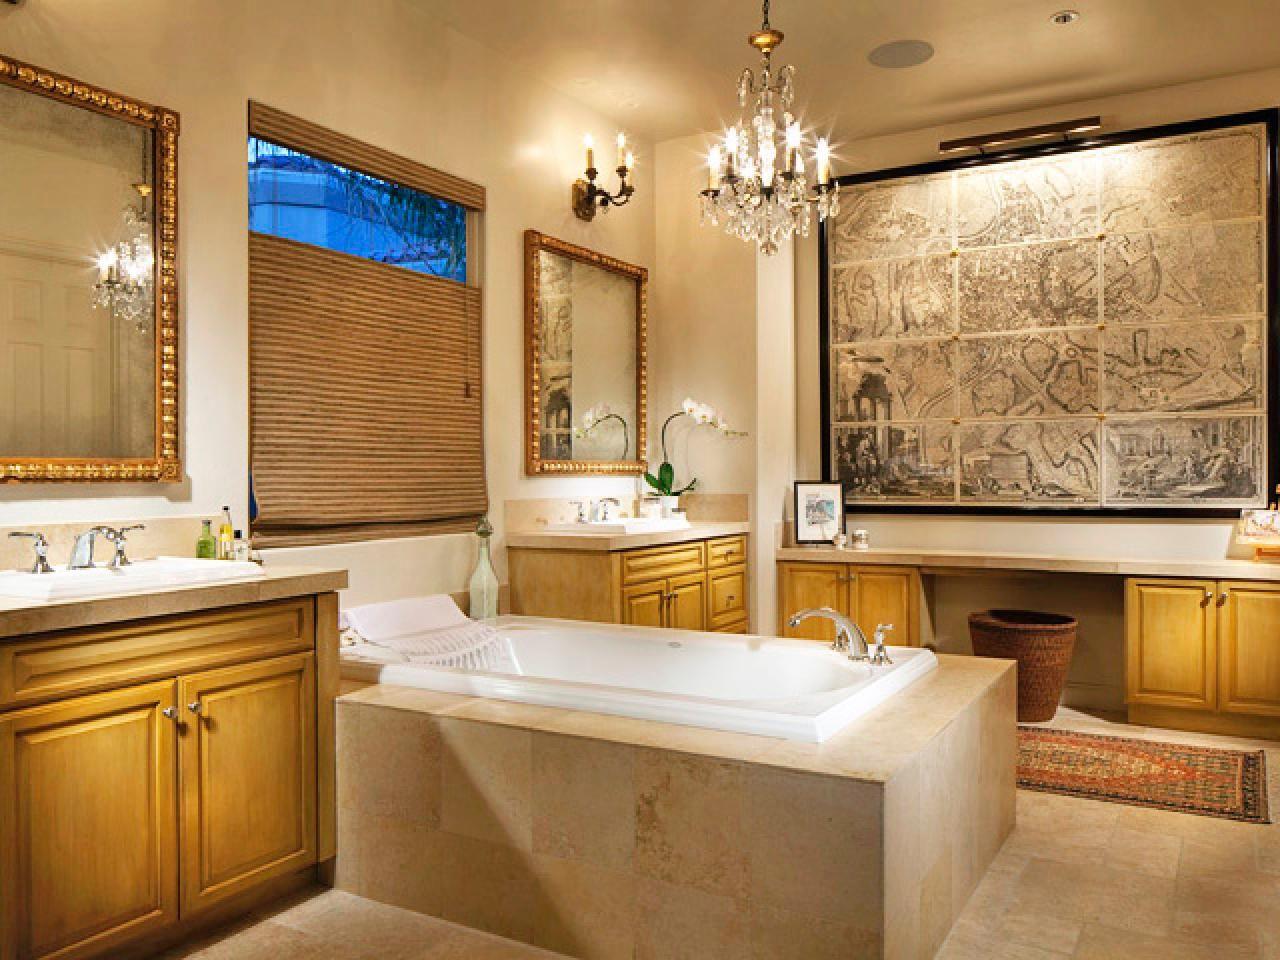 modern bathroom lighting luxury design. Pictures Of Beautiful Luxury Bathtubs - Ideas \u0026 Inspiration. Glamorous BathroomModern Modern Bathroom Lighting Design